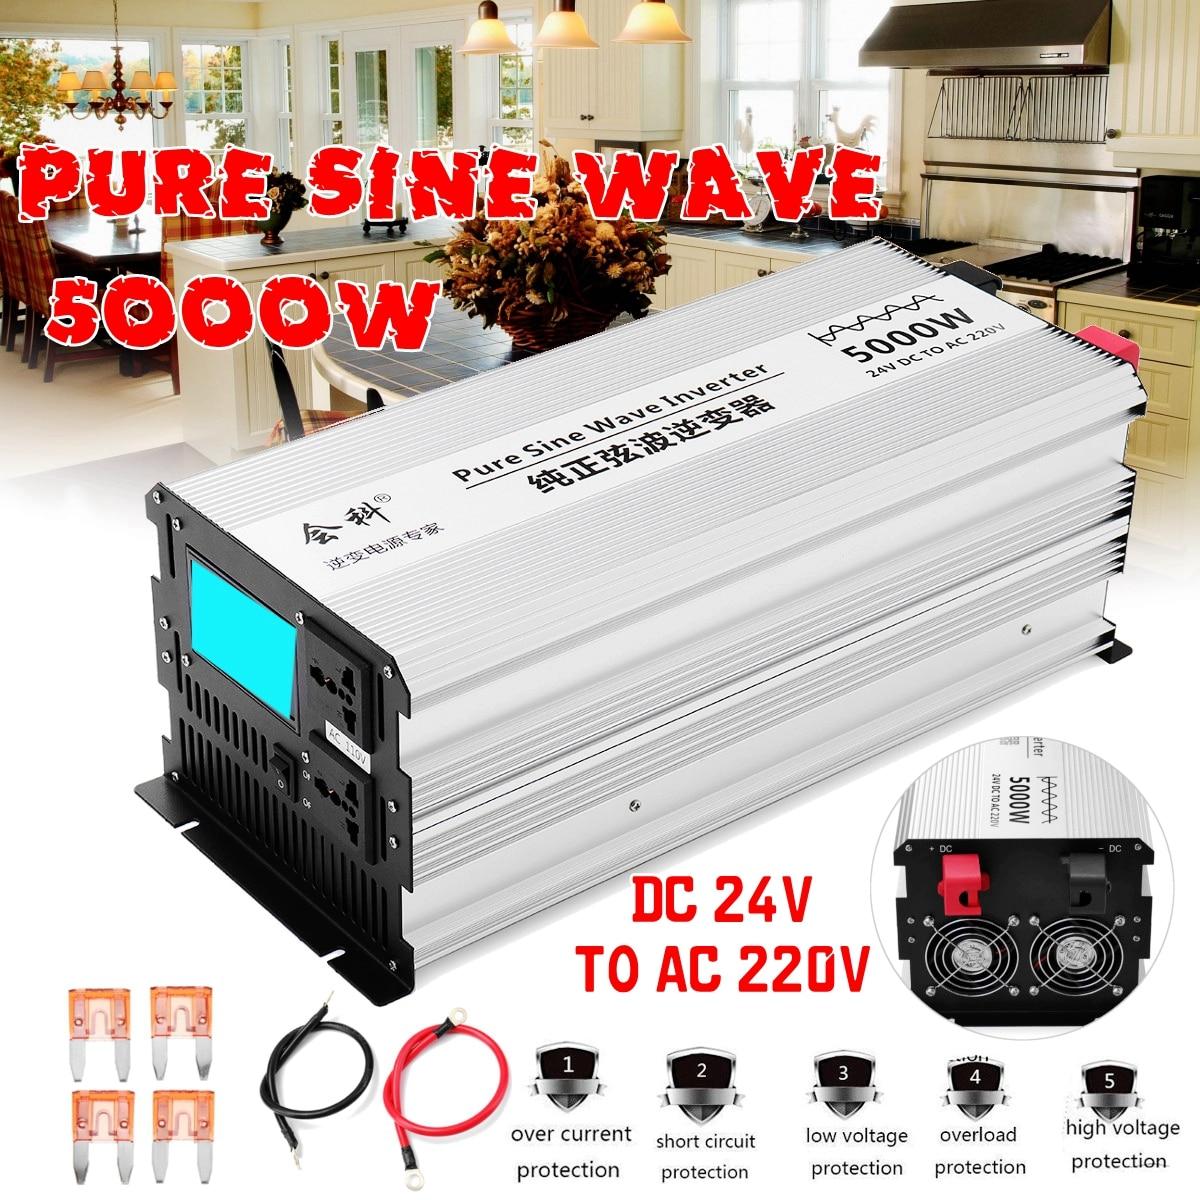 Inverter onda sinusoidale pura 2500 w 5000 w P eak 50 hz DC 12 v/24 v/48 v per AC 110 v/220 v di Tensione Trasformatore Converte display A LED Inverter